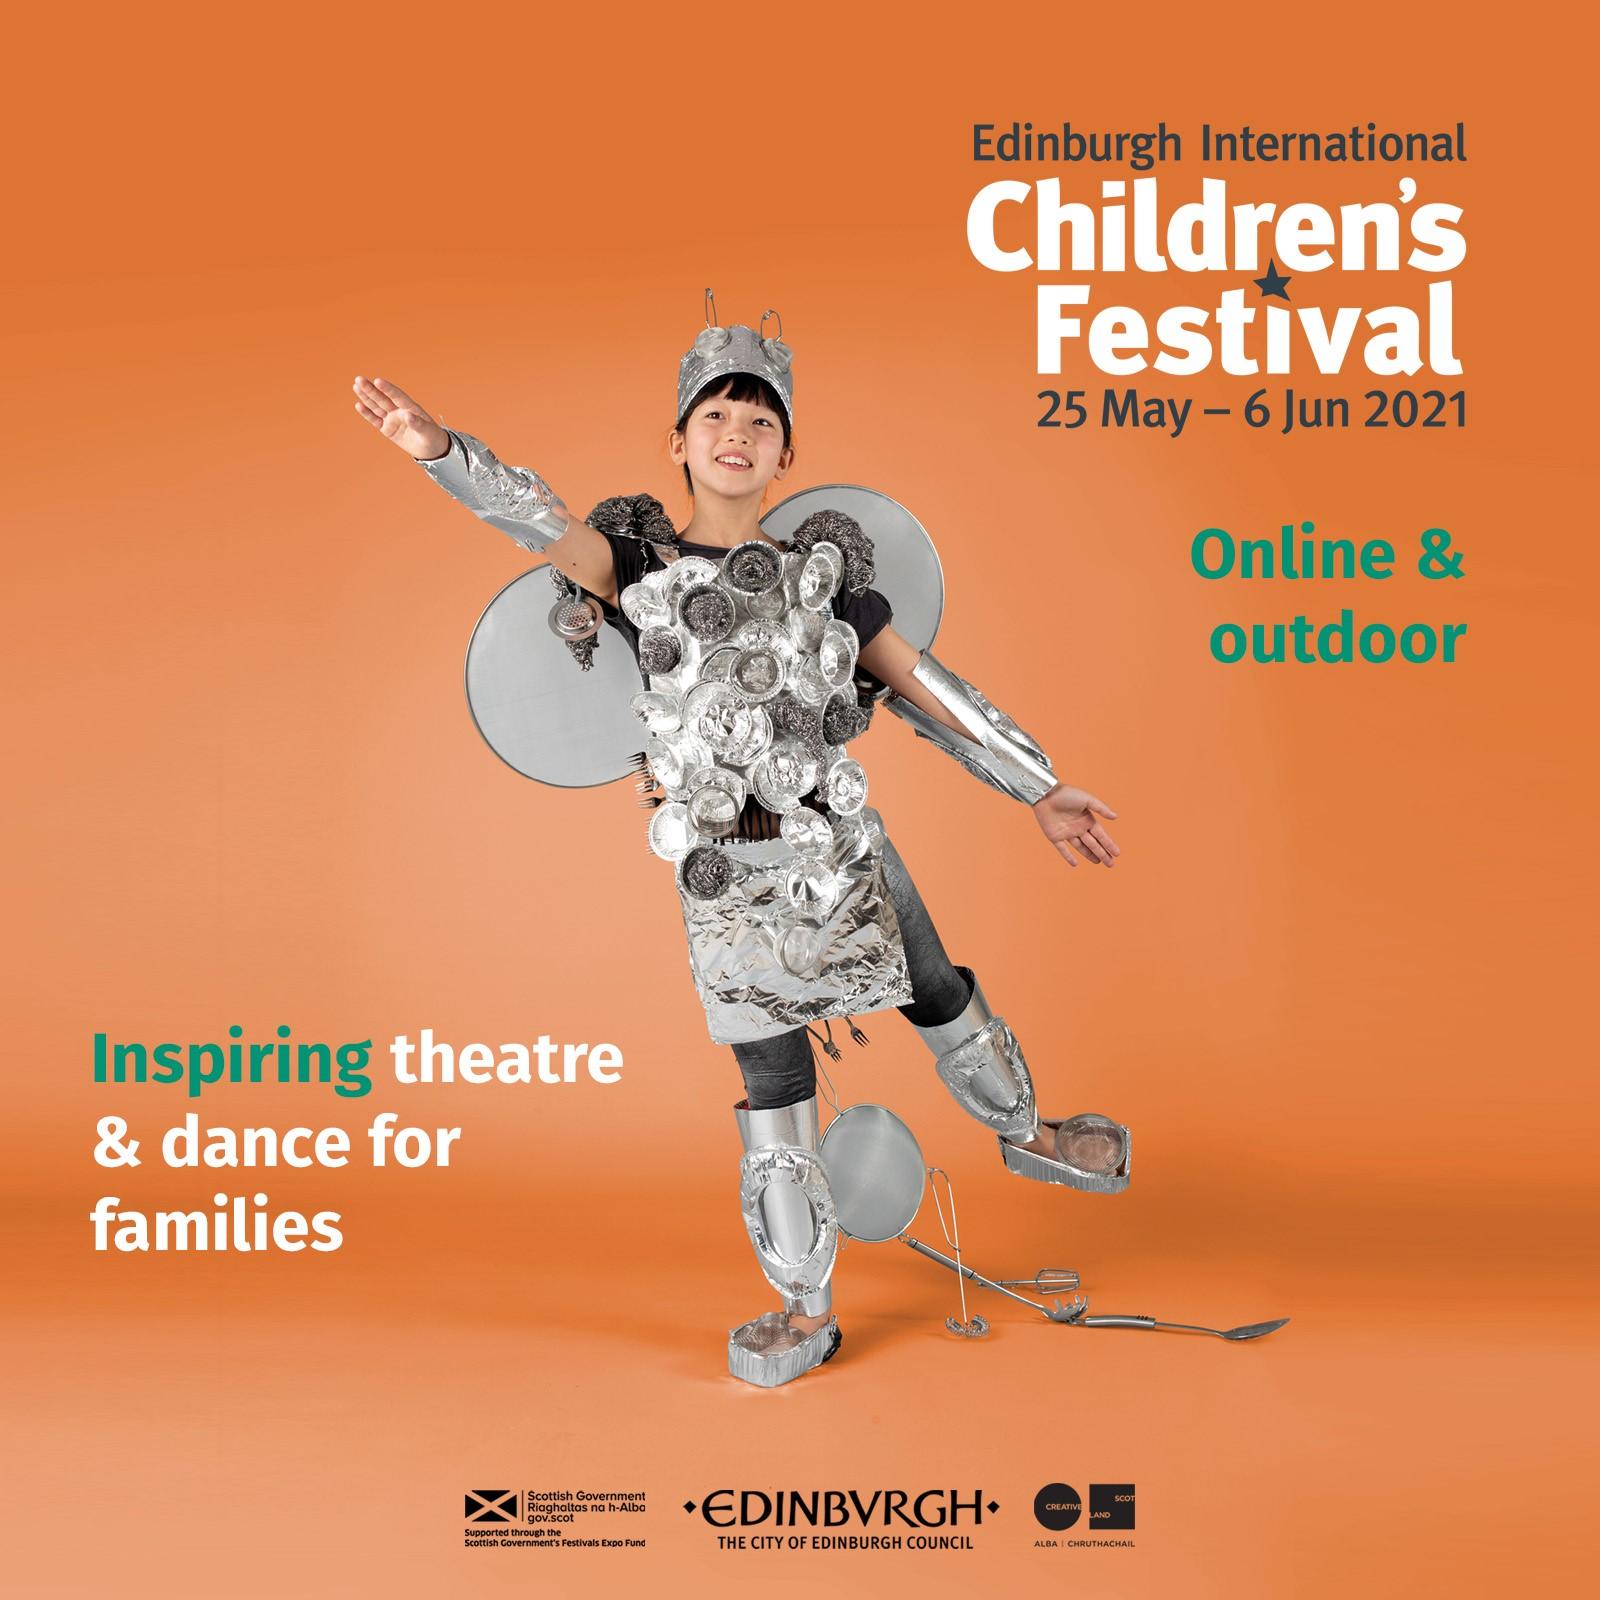 Poster for 2021 Children's Festival: Edinburgh International Children's Festival. 25 May - 6 June 2021. Online and outdoor. Inspiring theatre and dance for families.